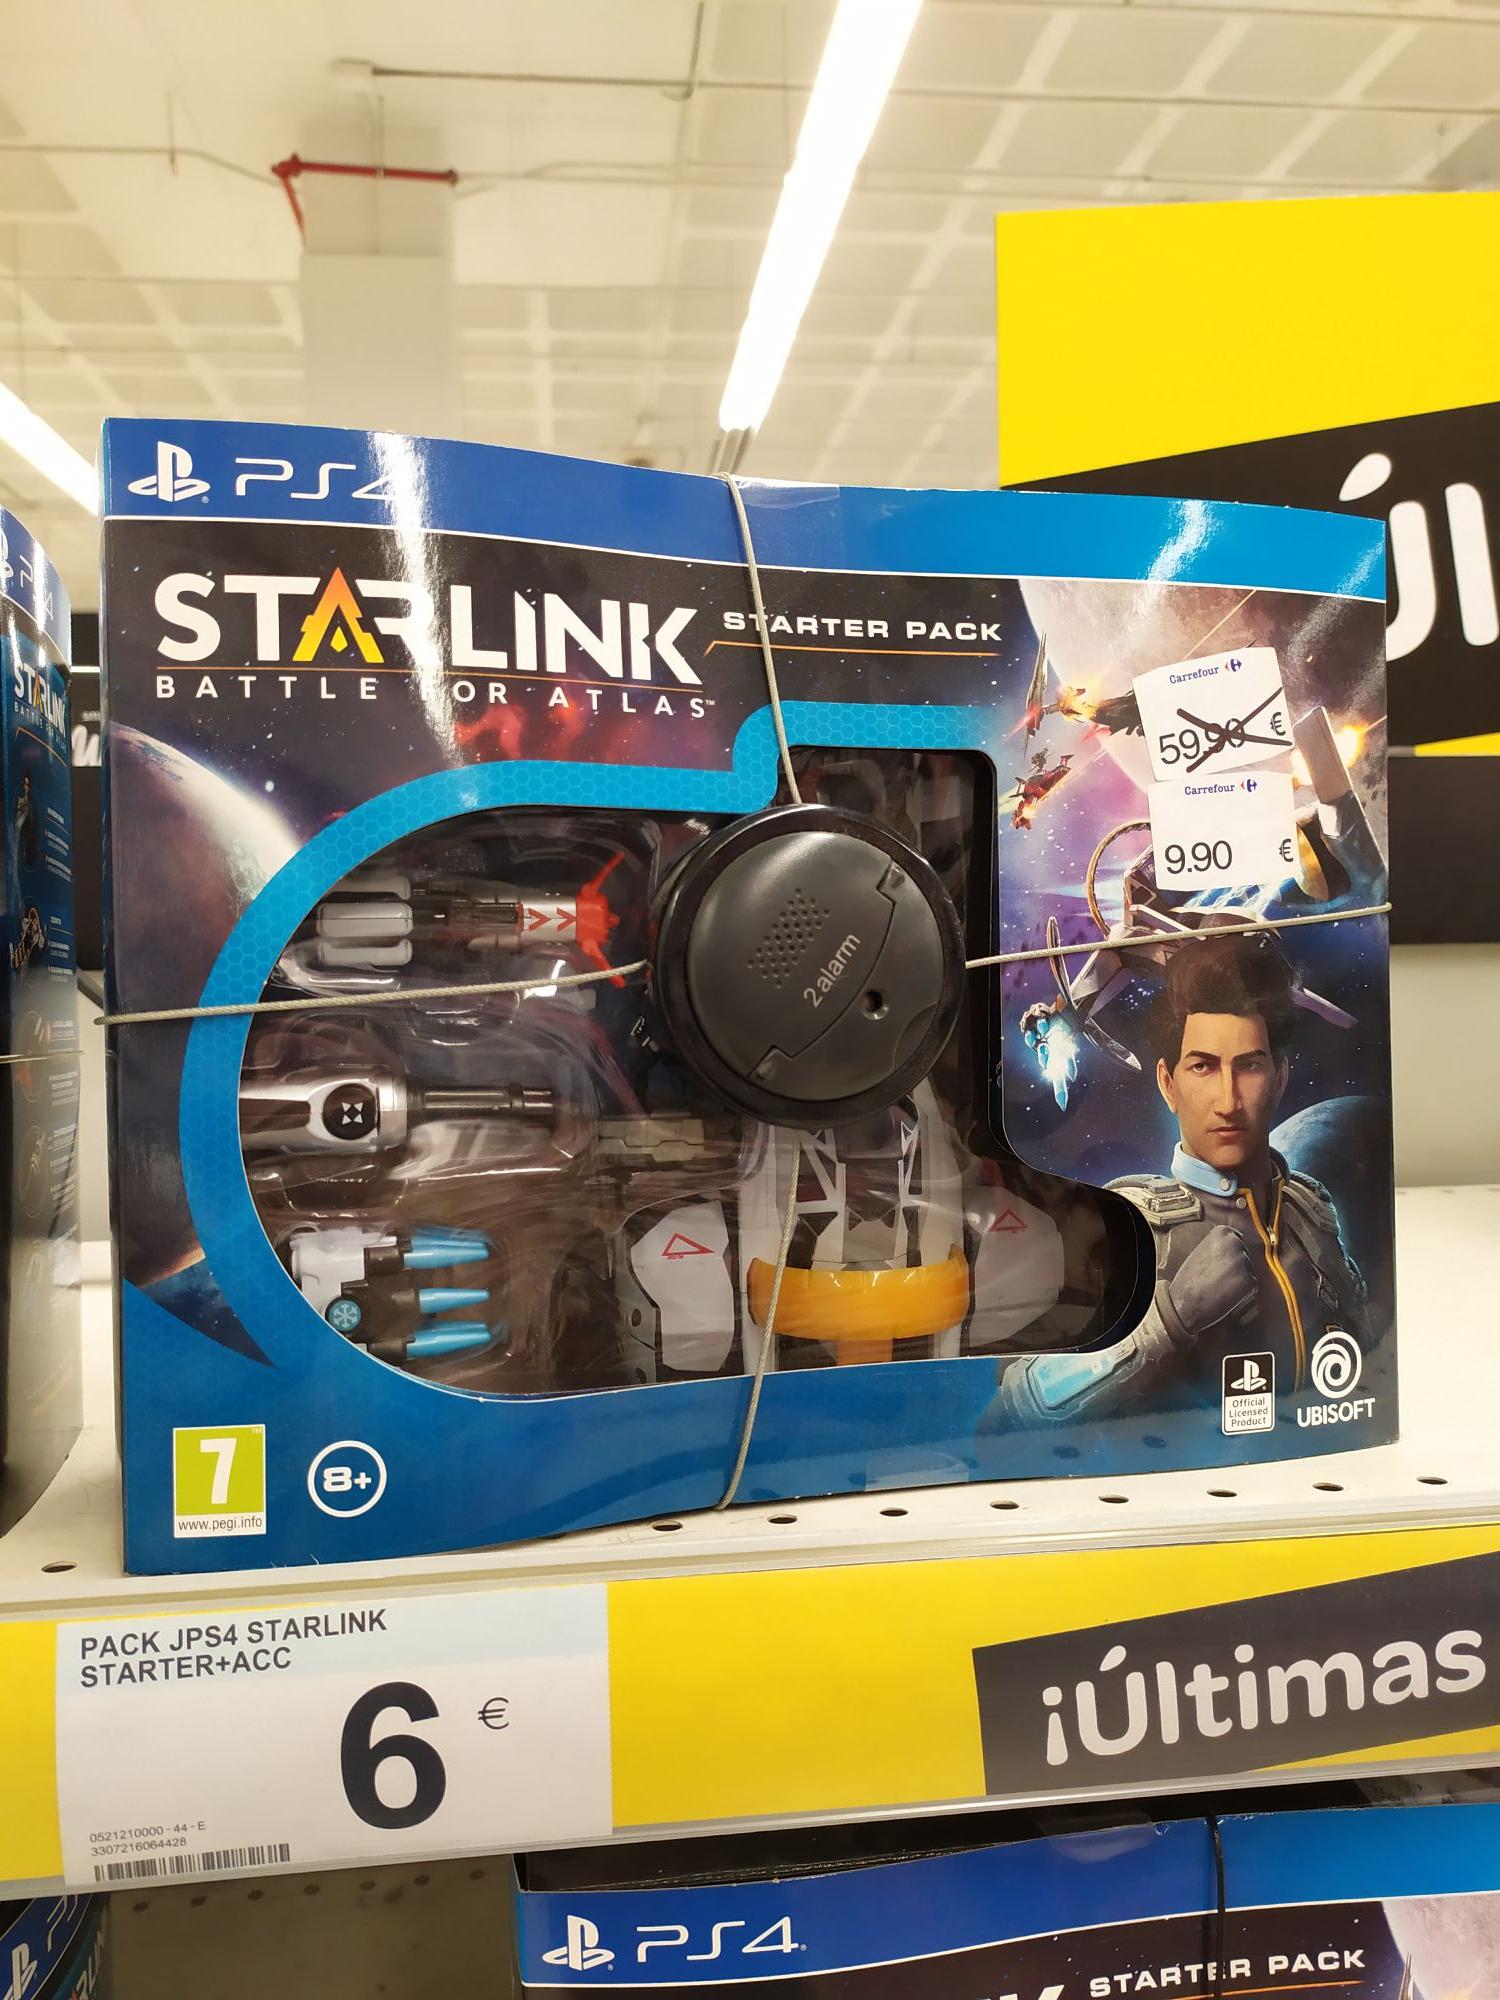 Juego starlink starter pack ps4 (Carrefour Gran Vía de Alicante)